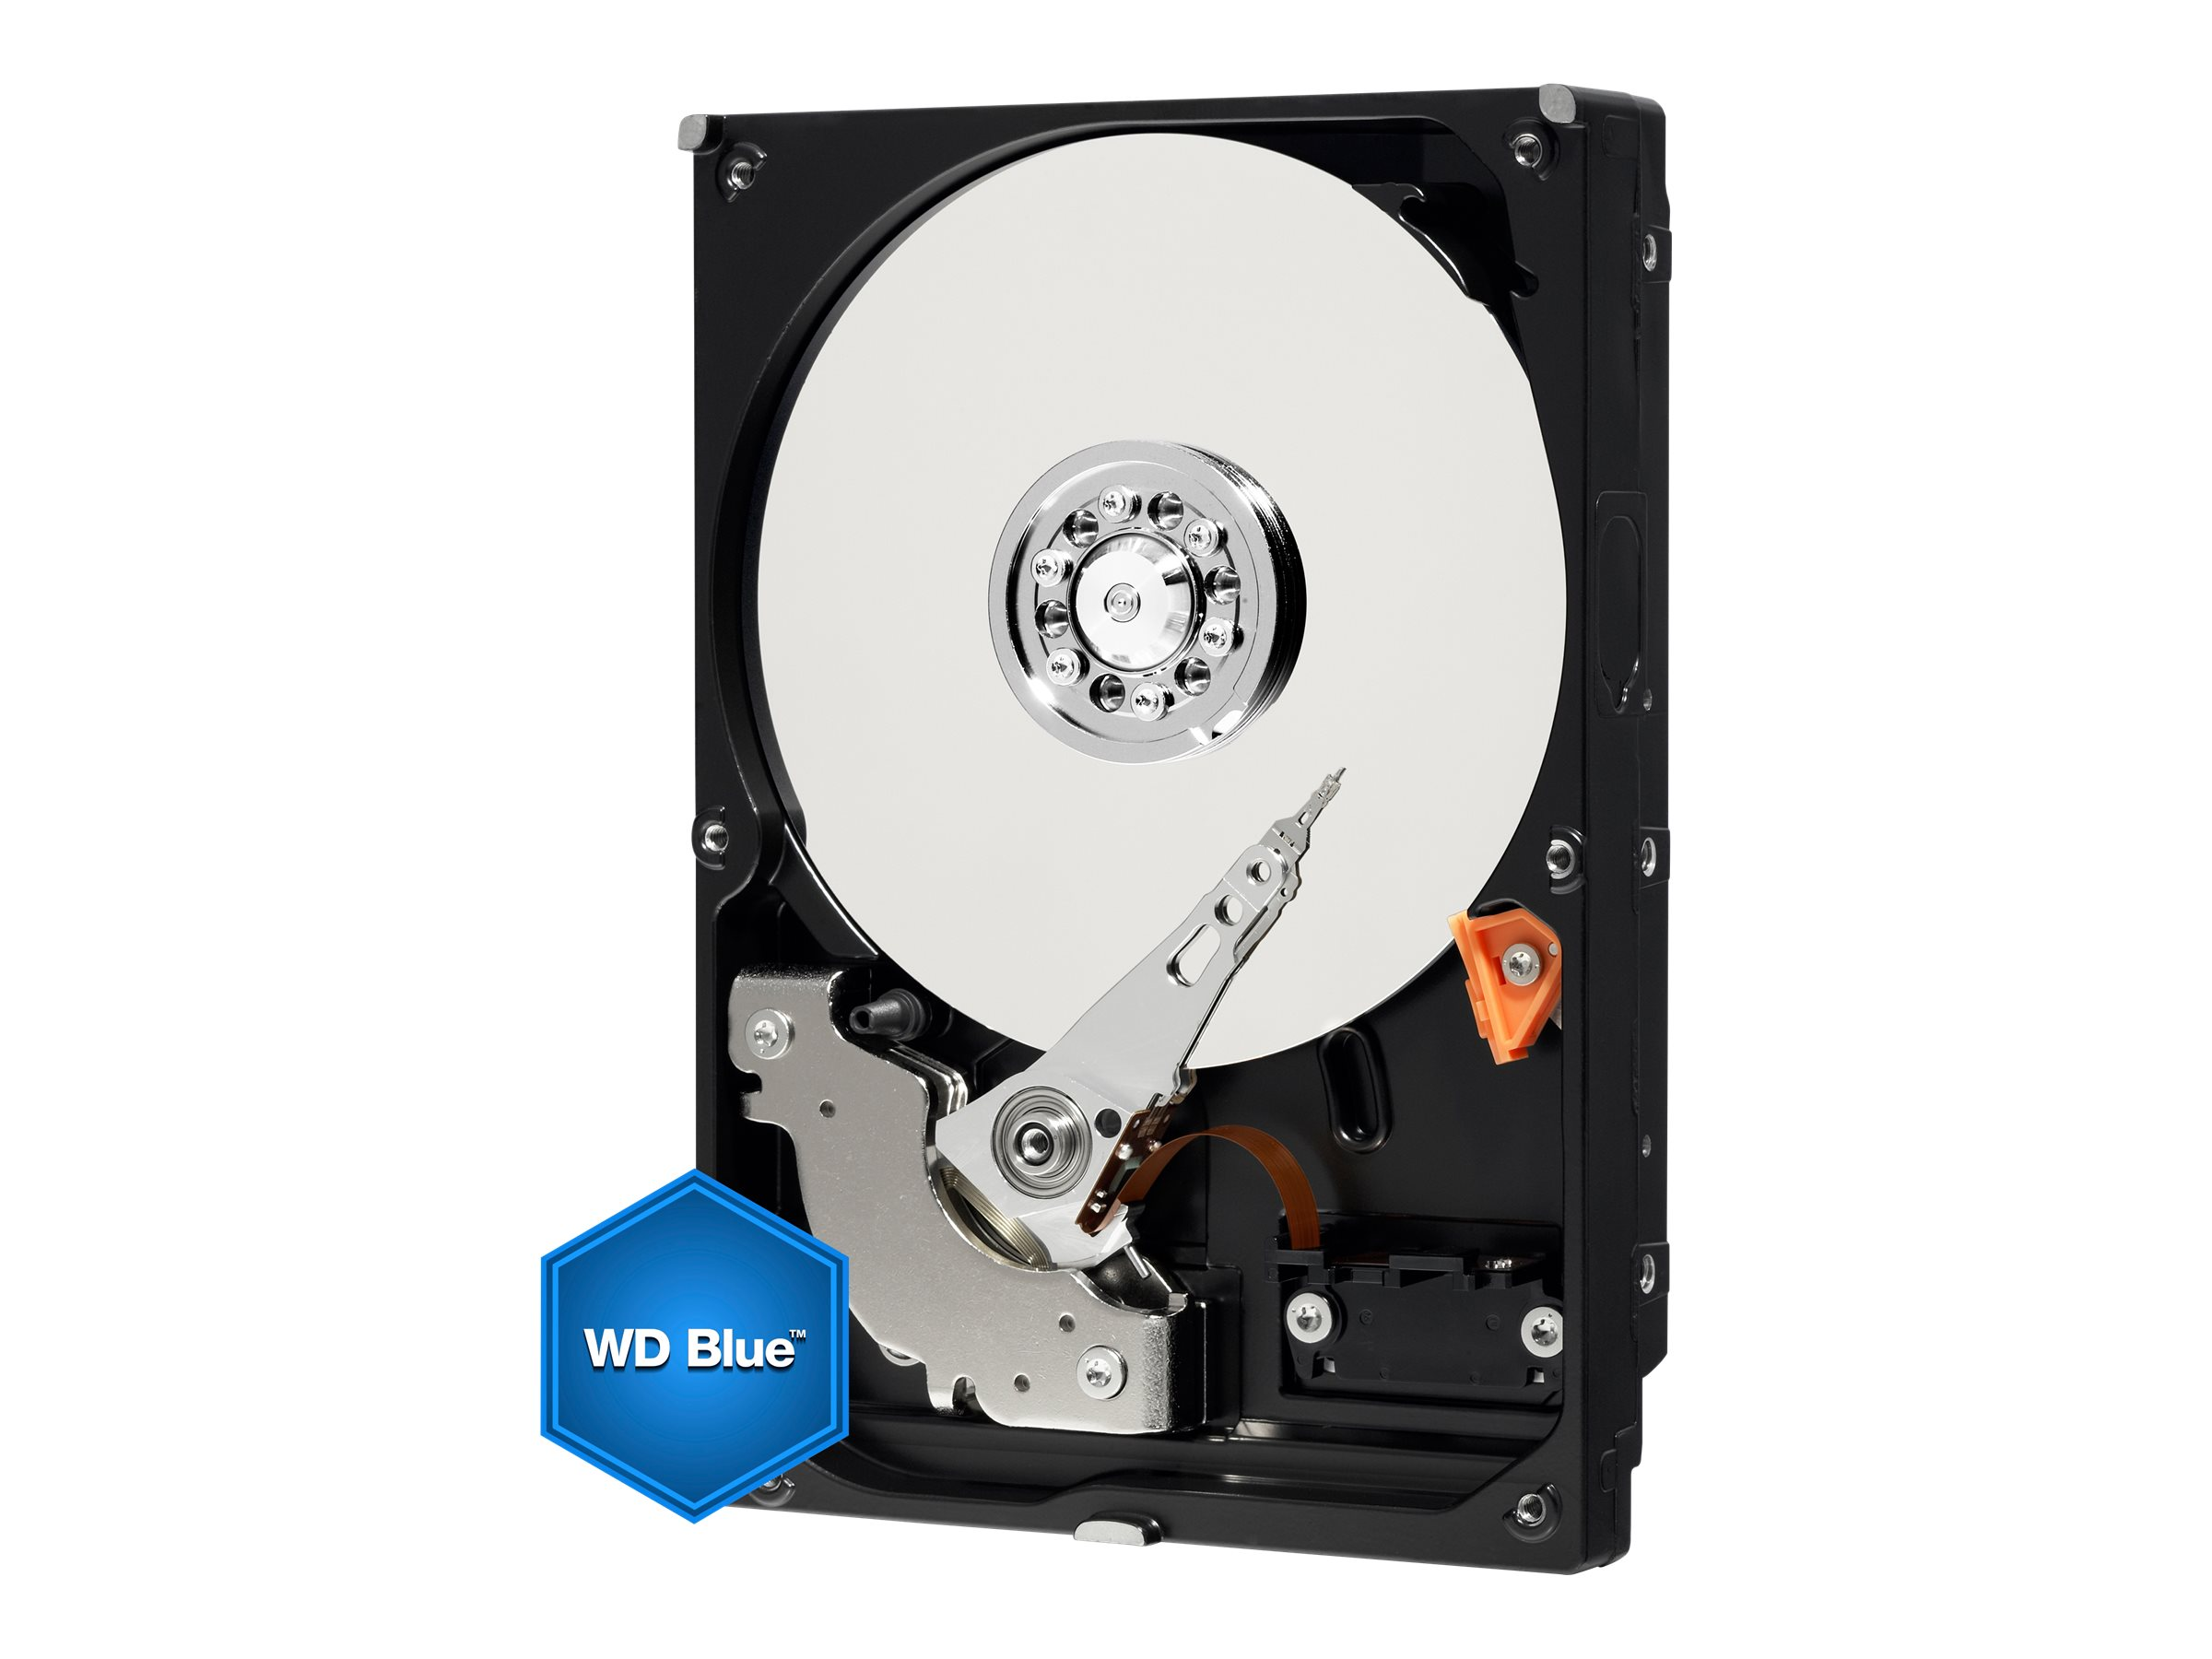 WD Blue WD5000AZLX - Festplatte